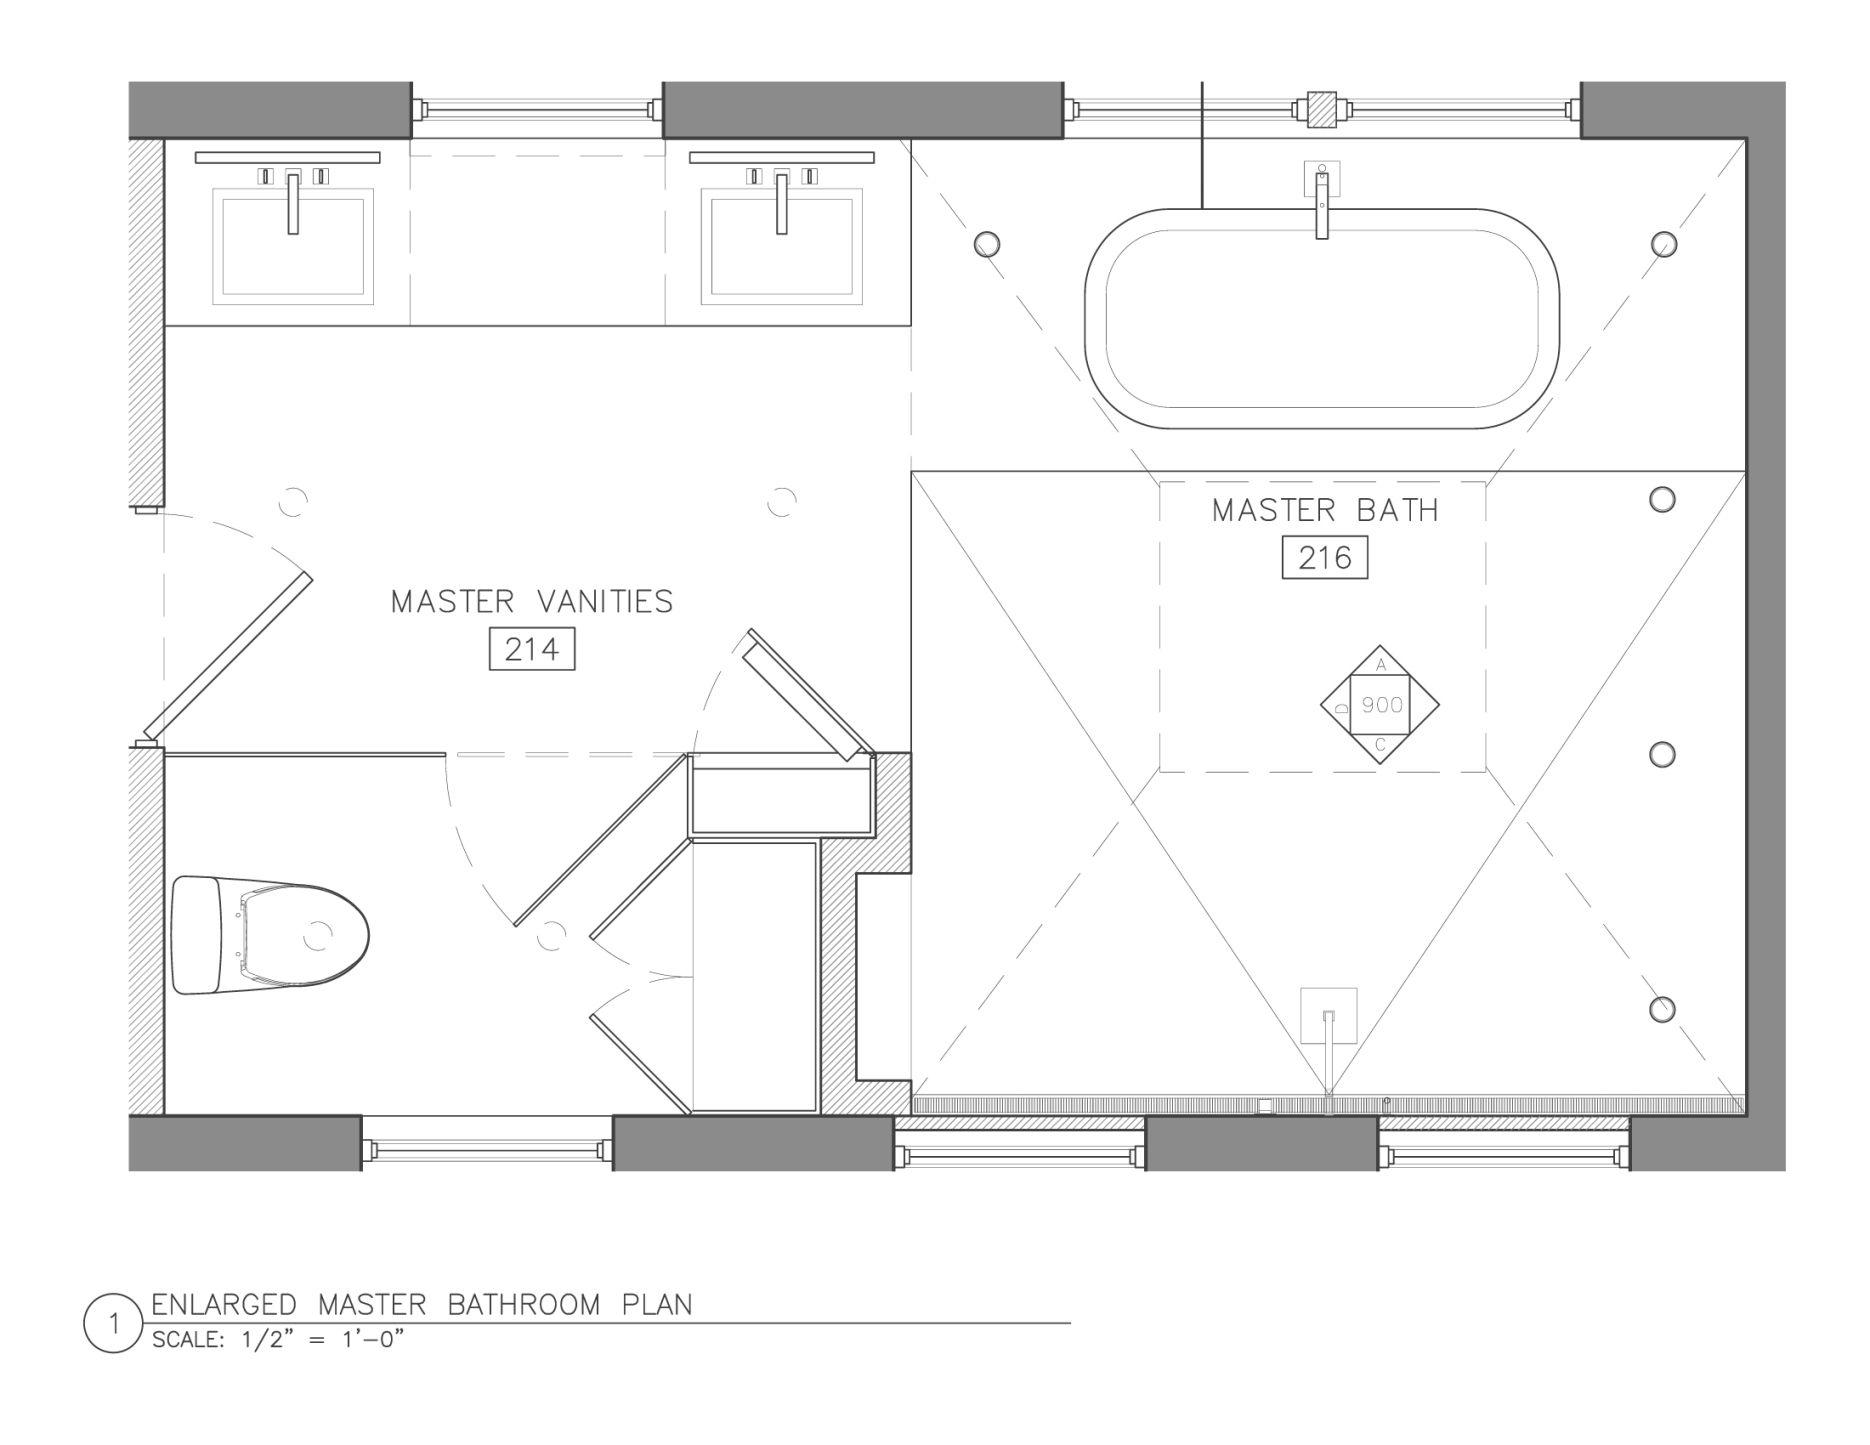 8 12 Bathroom Floor Plans: Awesome Ideas Bathroom Floor Plans 8 X 12 7 X Master Bath